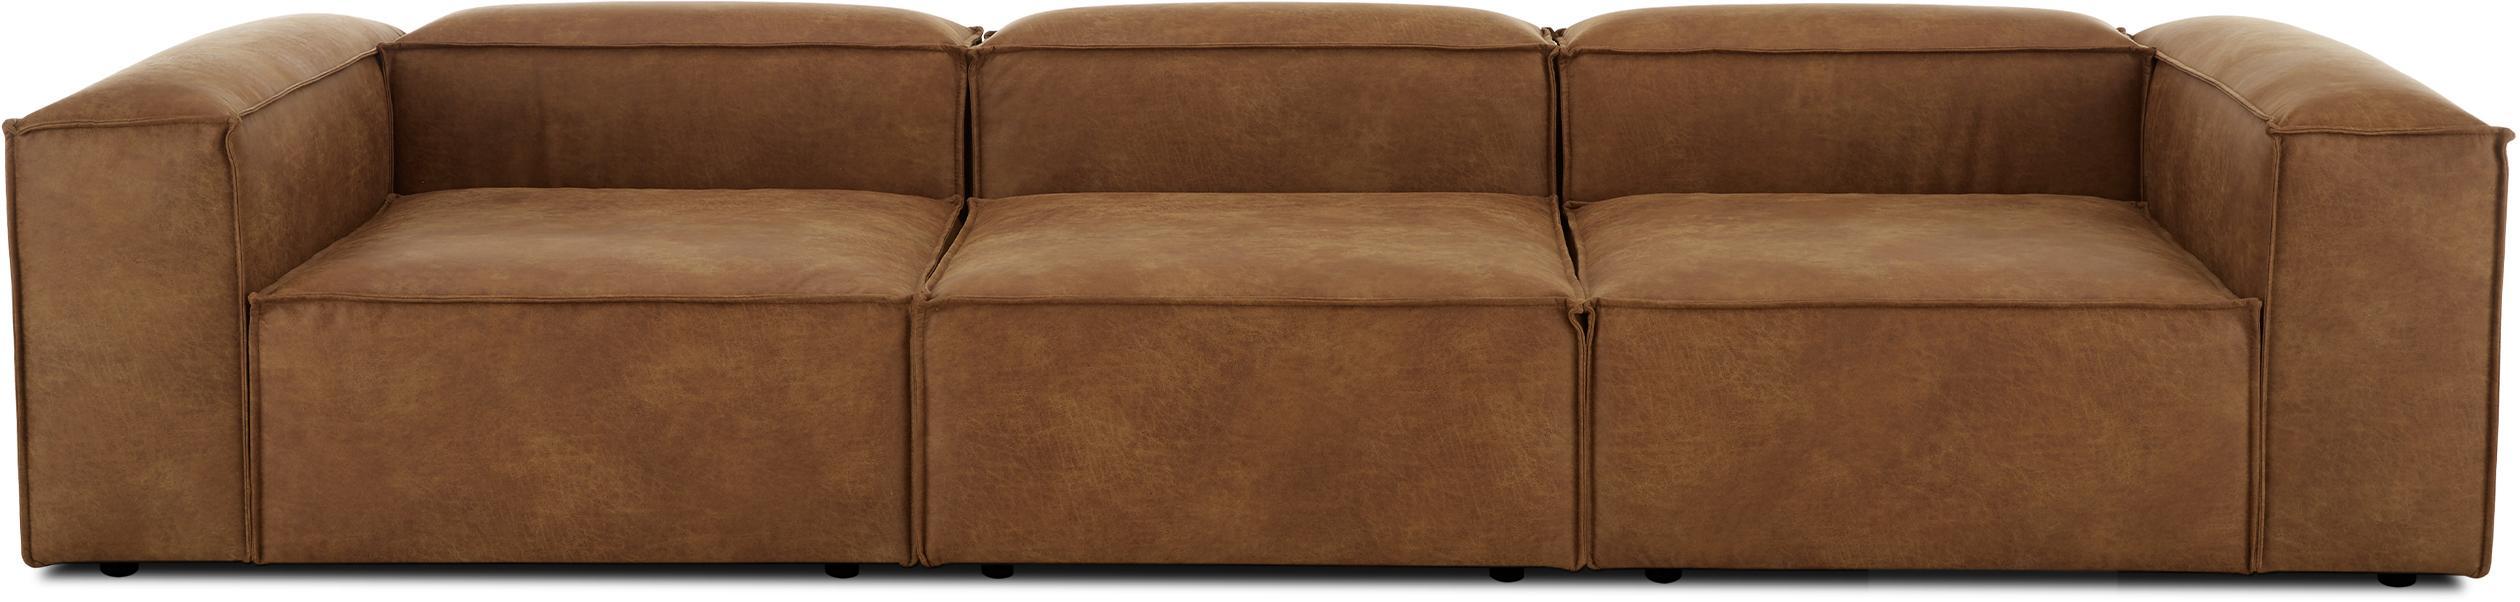 Modulares Leder-Sofa Lennon (4-Sitzer), Bezug: 70% Leder, 30% Polyester , Gestell: Massives Kiefernholz, Spe, Füße: Kunststoff, Leder Braun, B 326 x T 119 cm